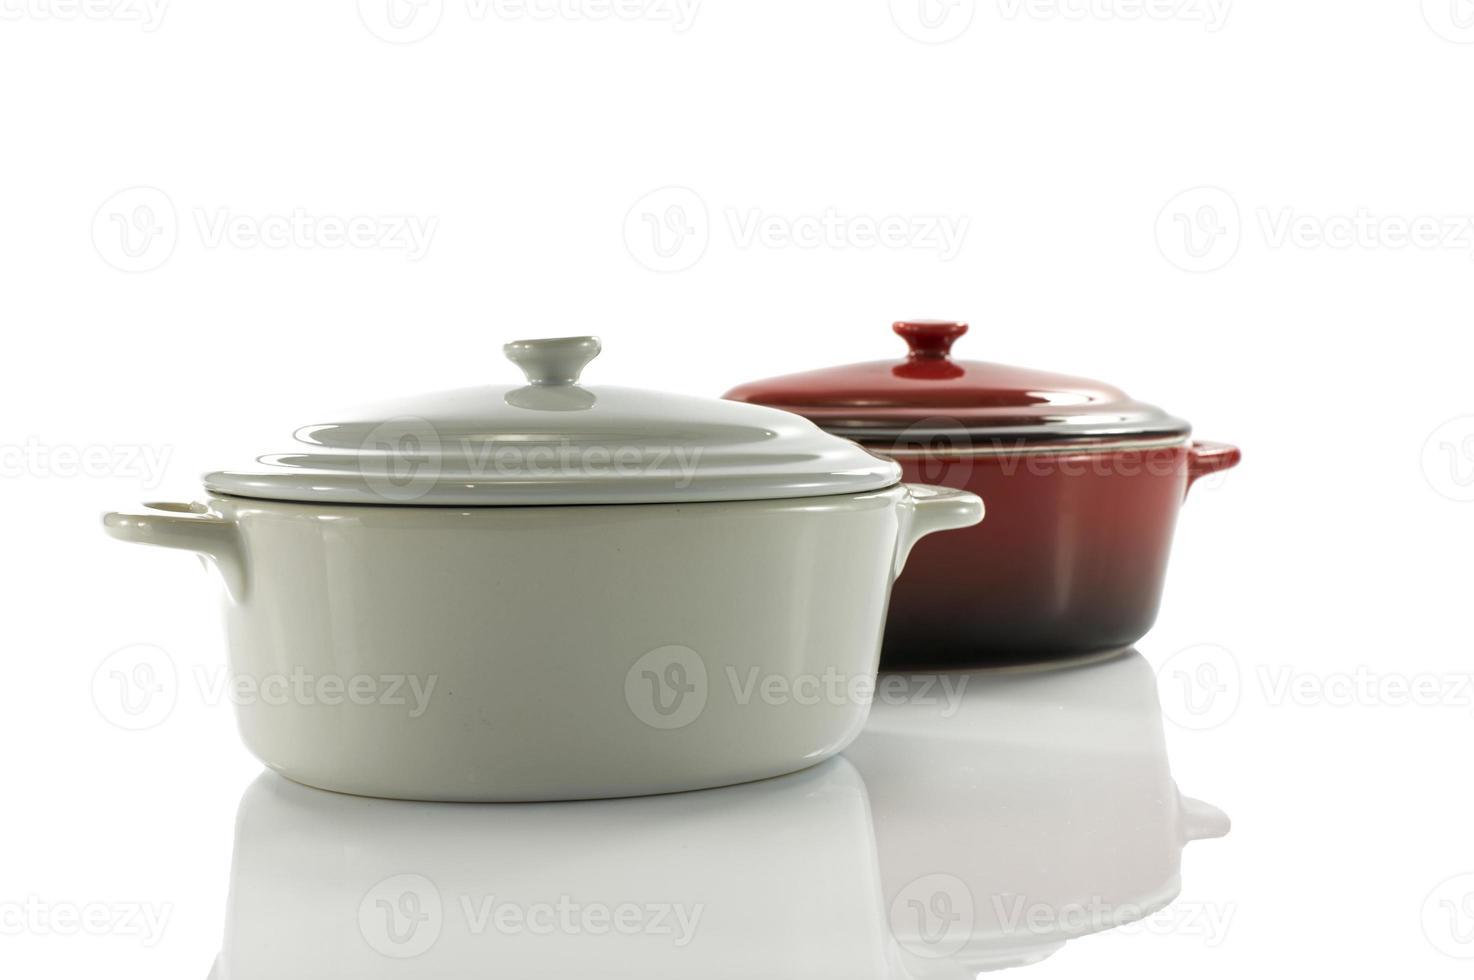 red and white saucepan photo